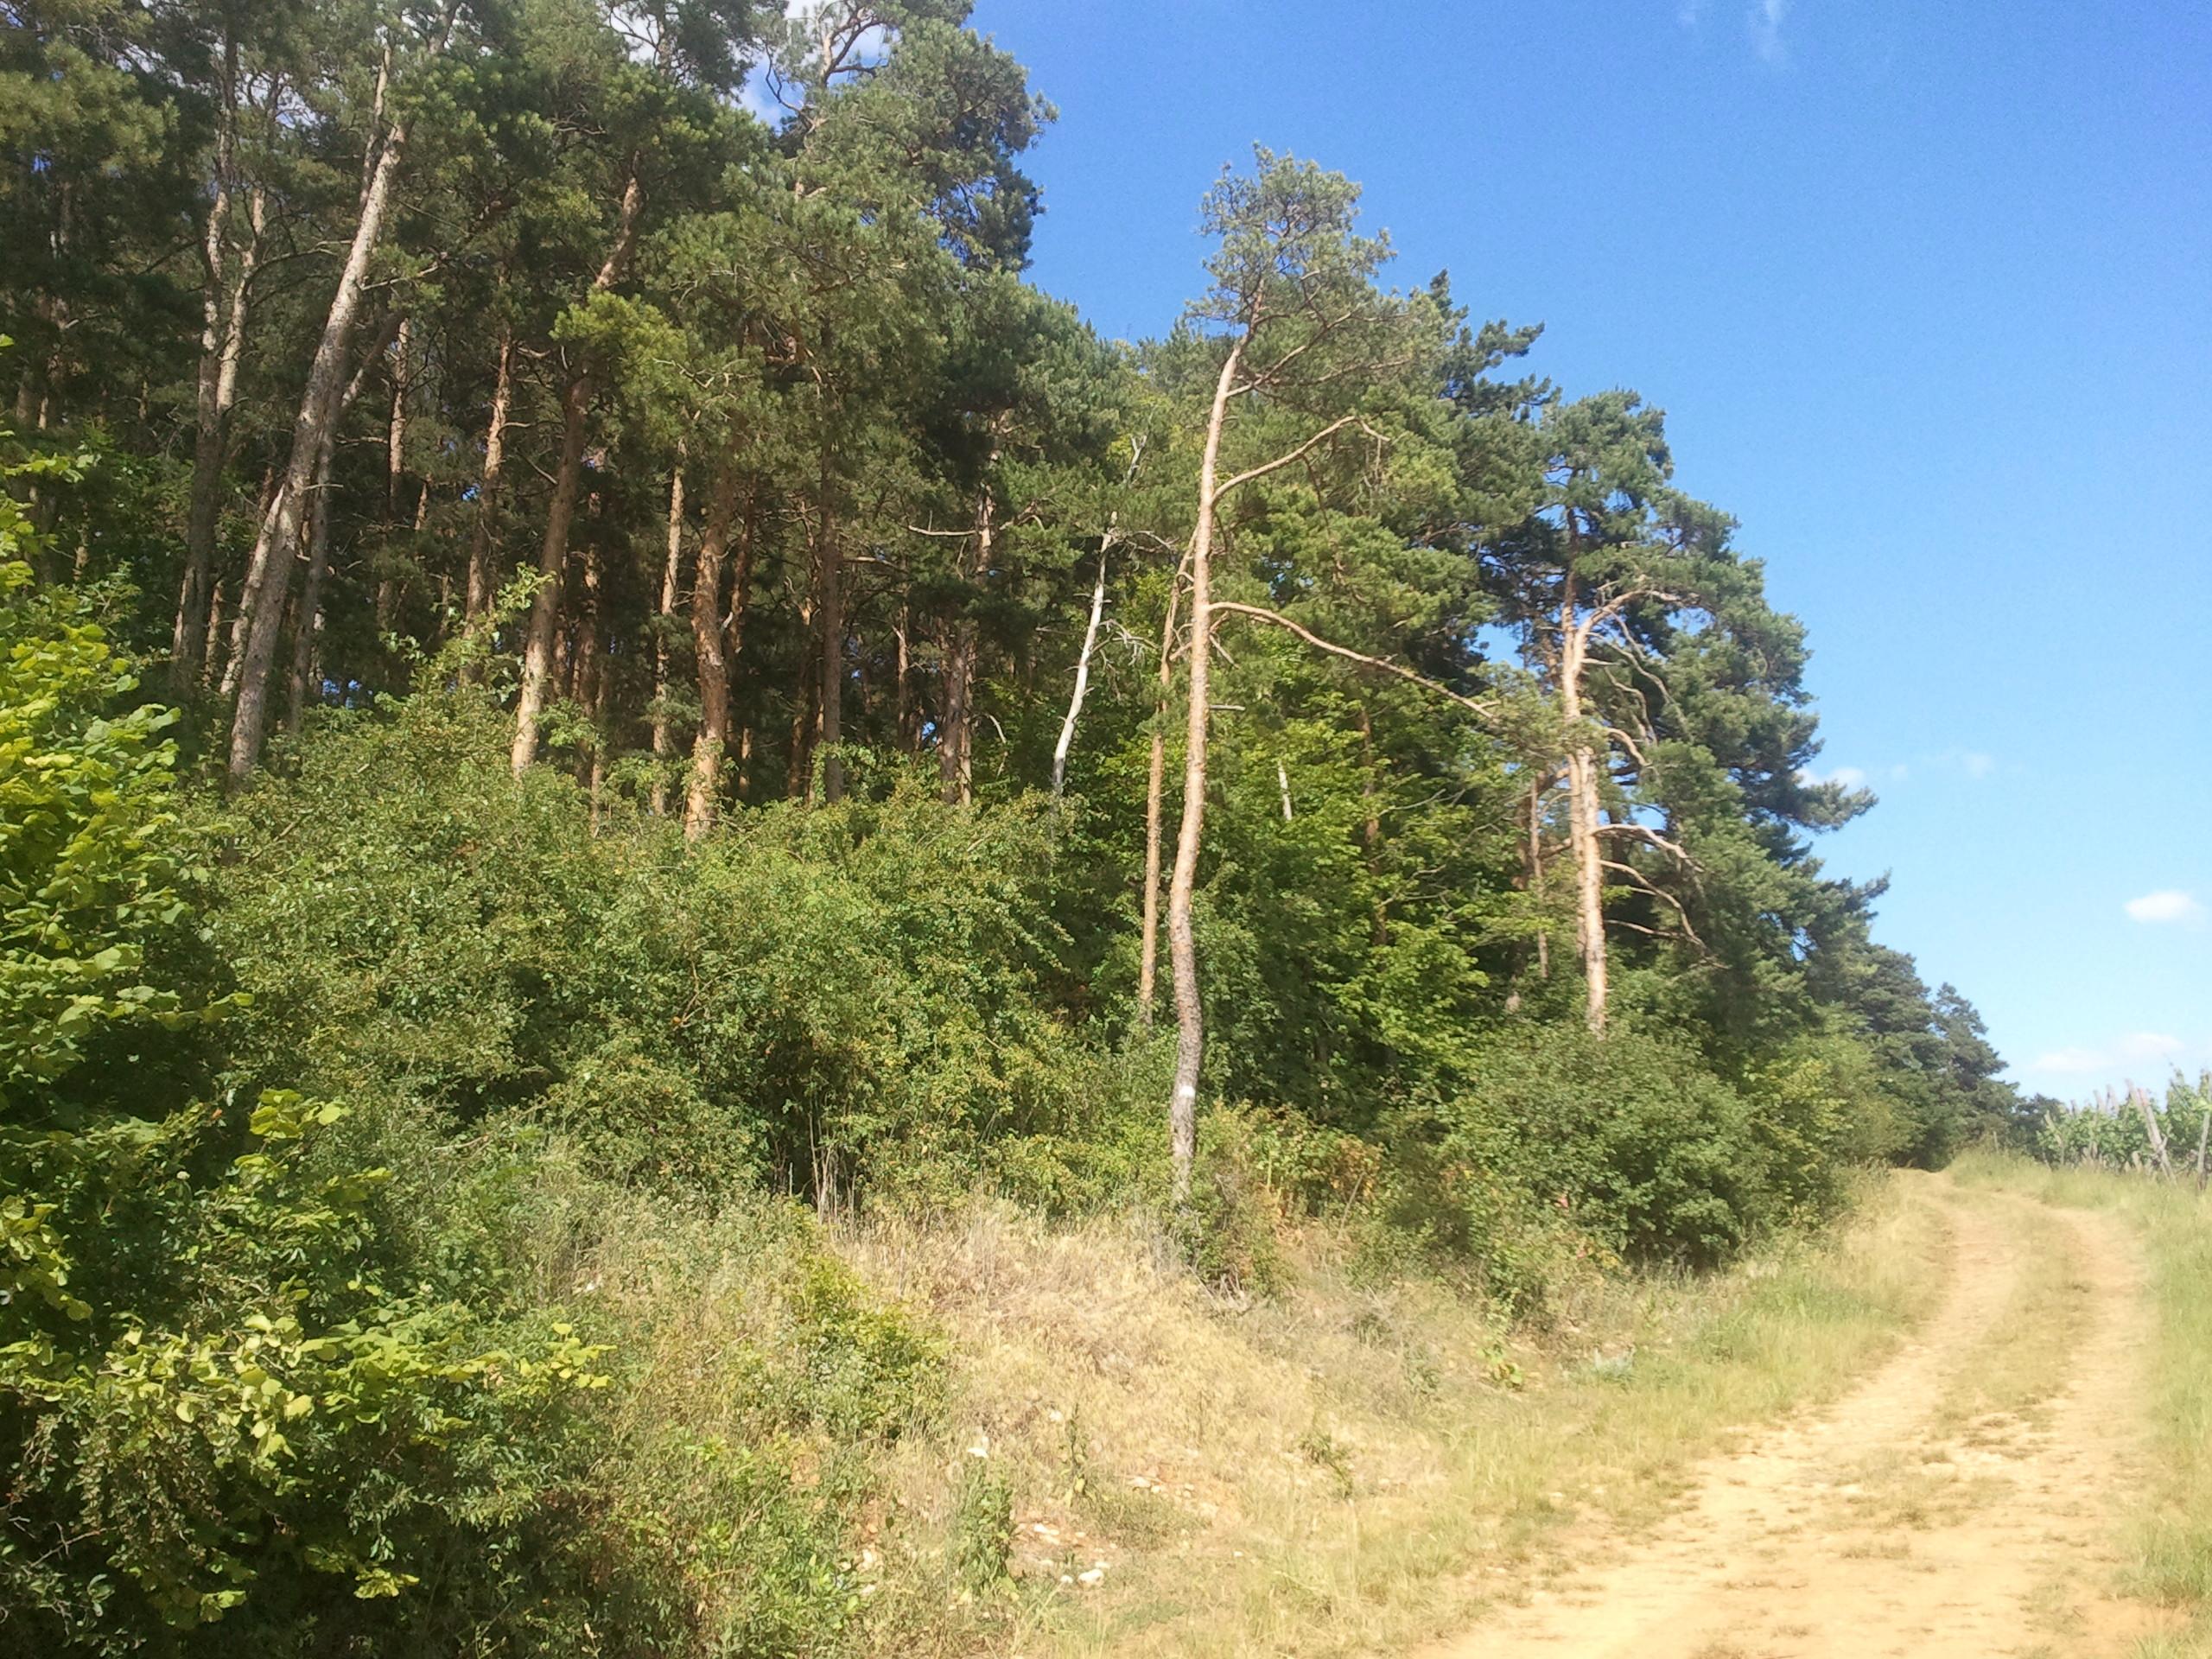 https://cdnfiles1.biolovision.net/www.faune-alsace.org/userfiles/Insectes/cigales/Cicadettacantilatrix-Barr-201406152.jpg